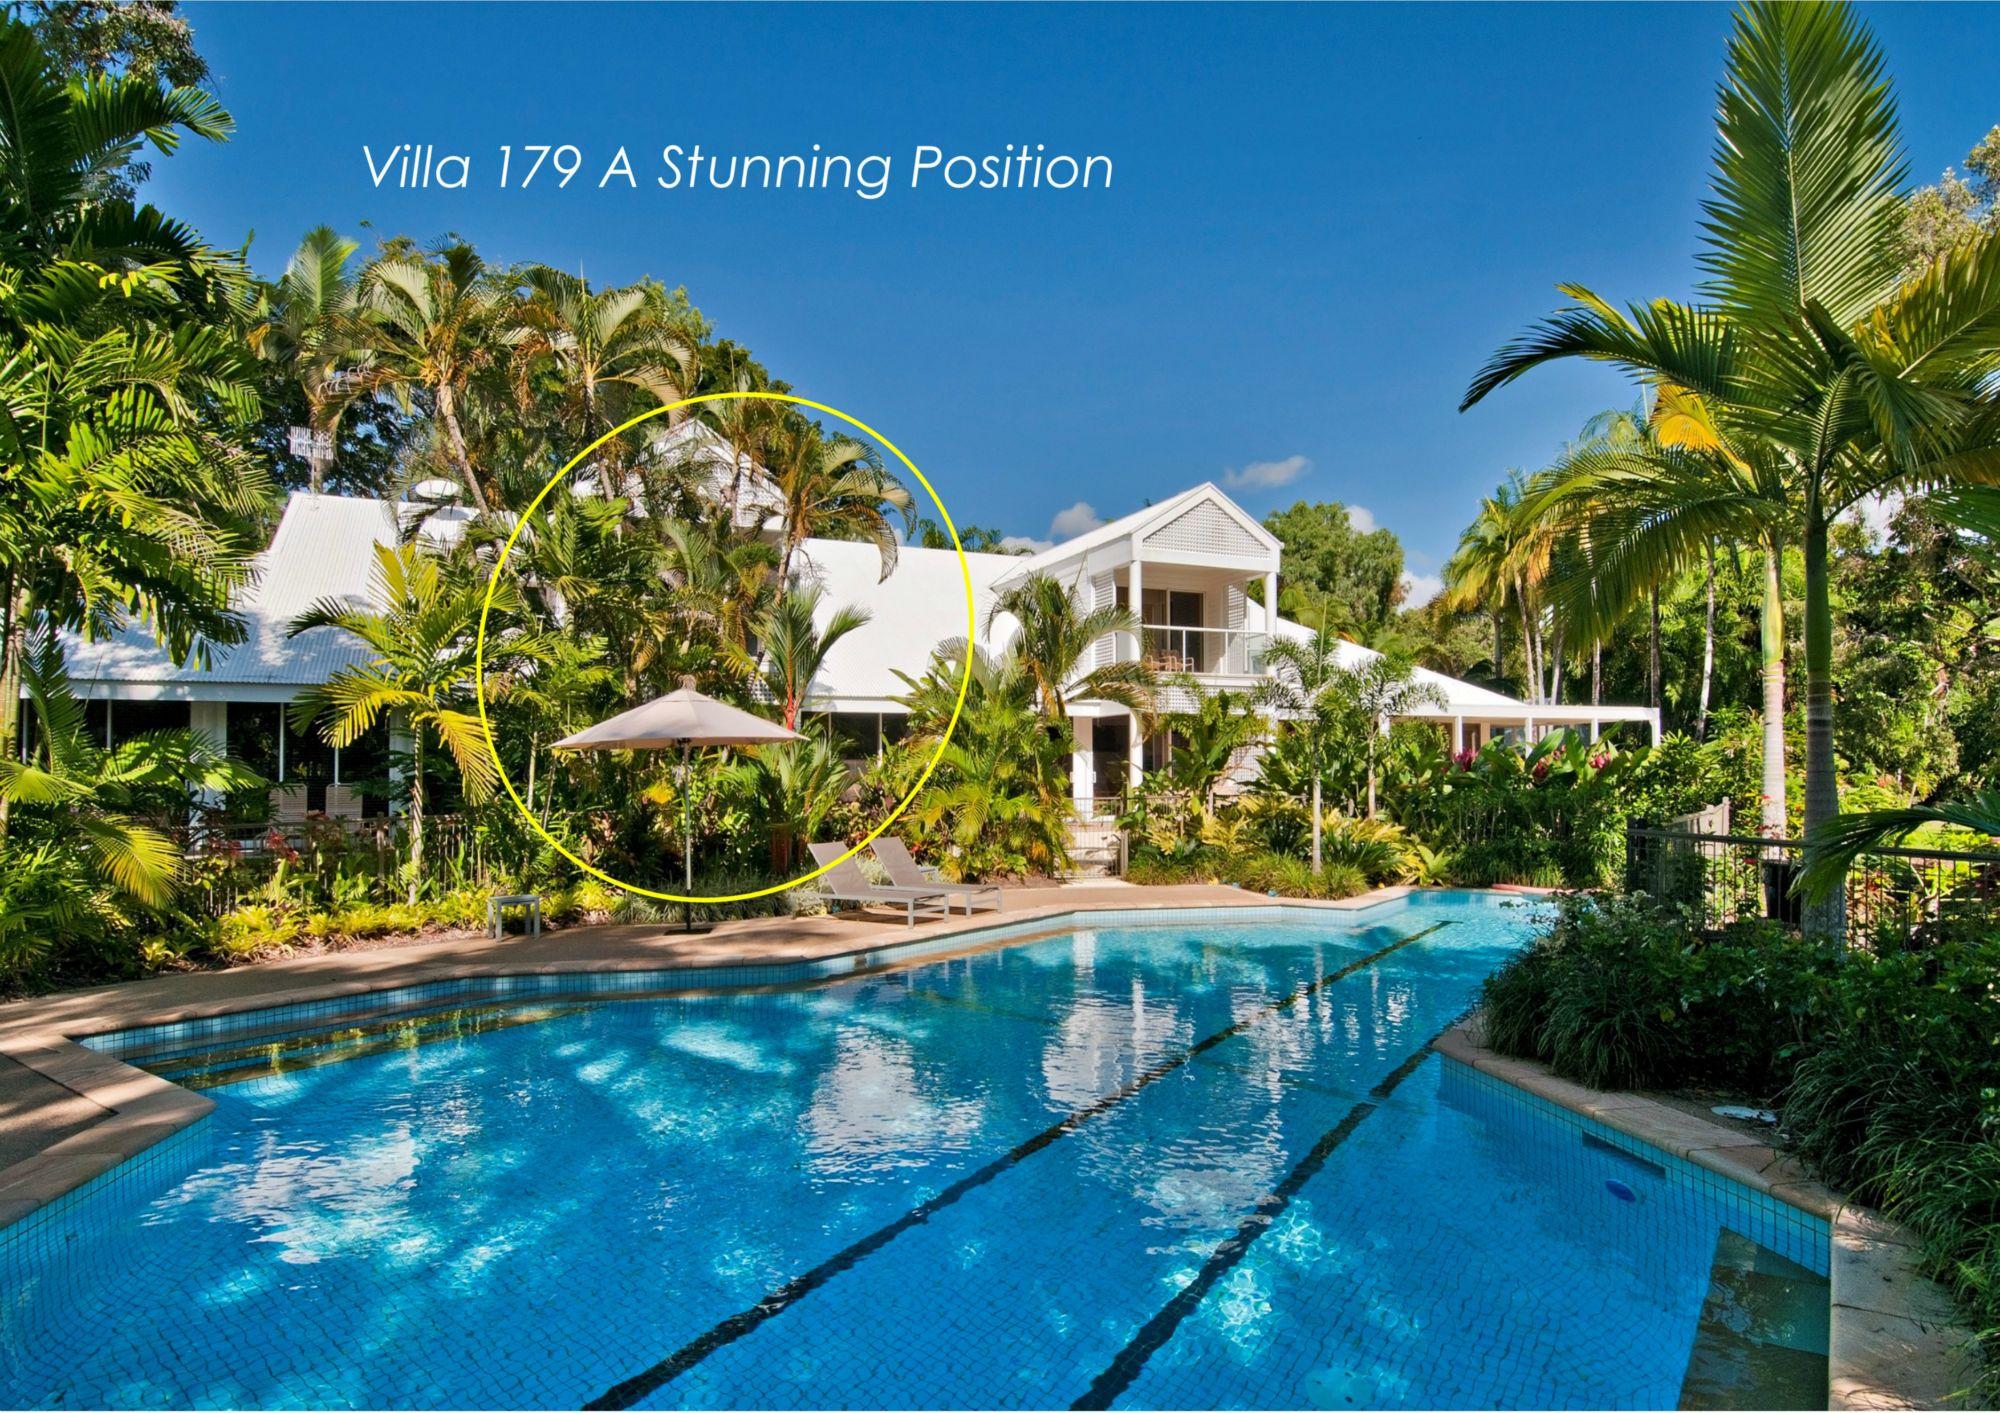 villa 179 sheraton mirage resort port douglas qld 4877. Black Bedroom Furniture Sets. Home Design Ideas